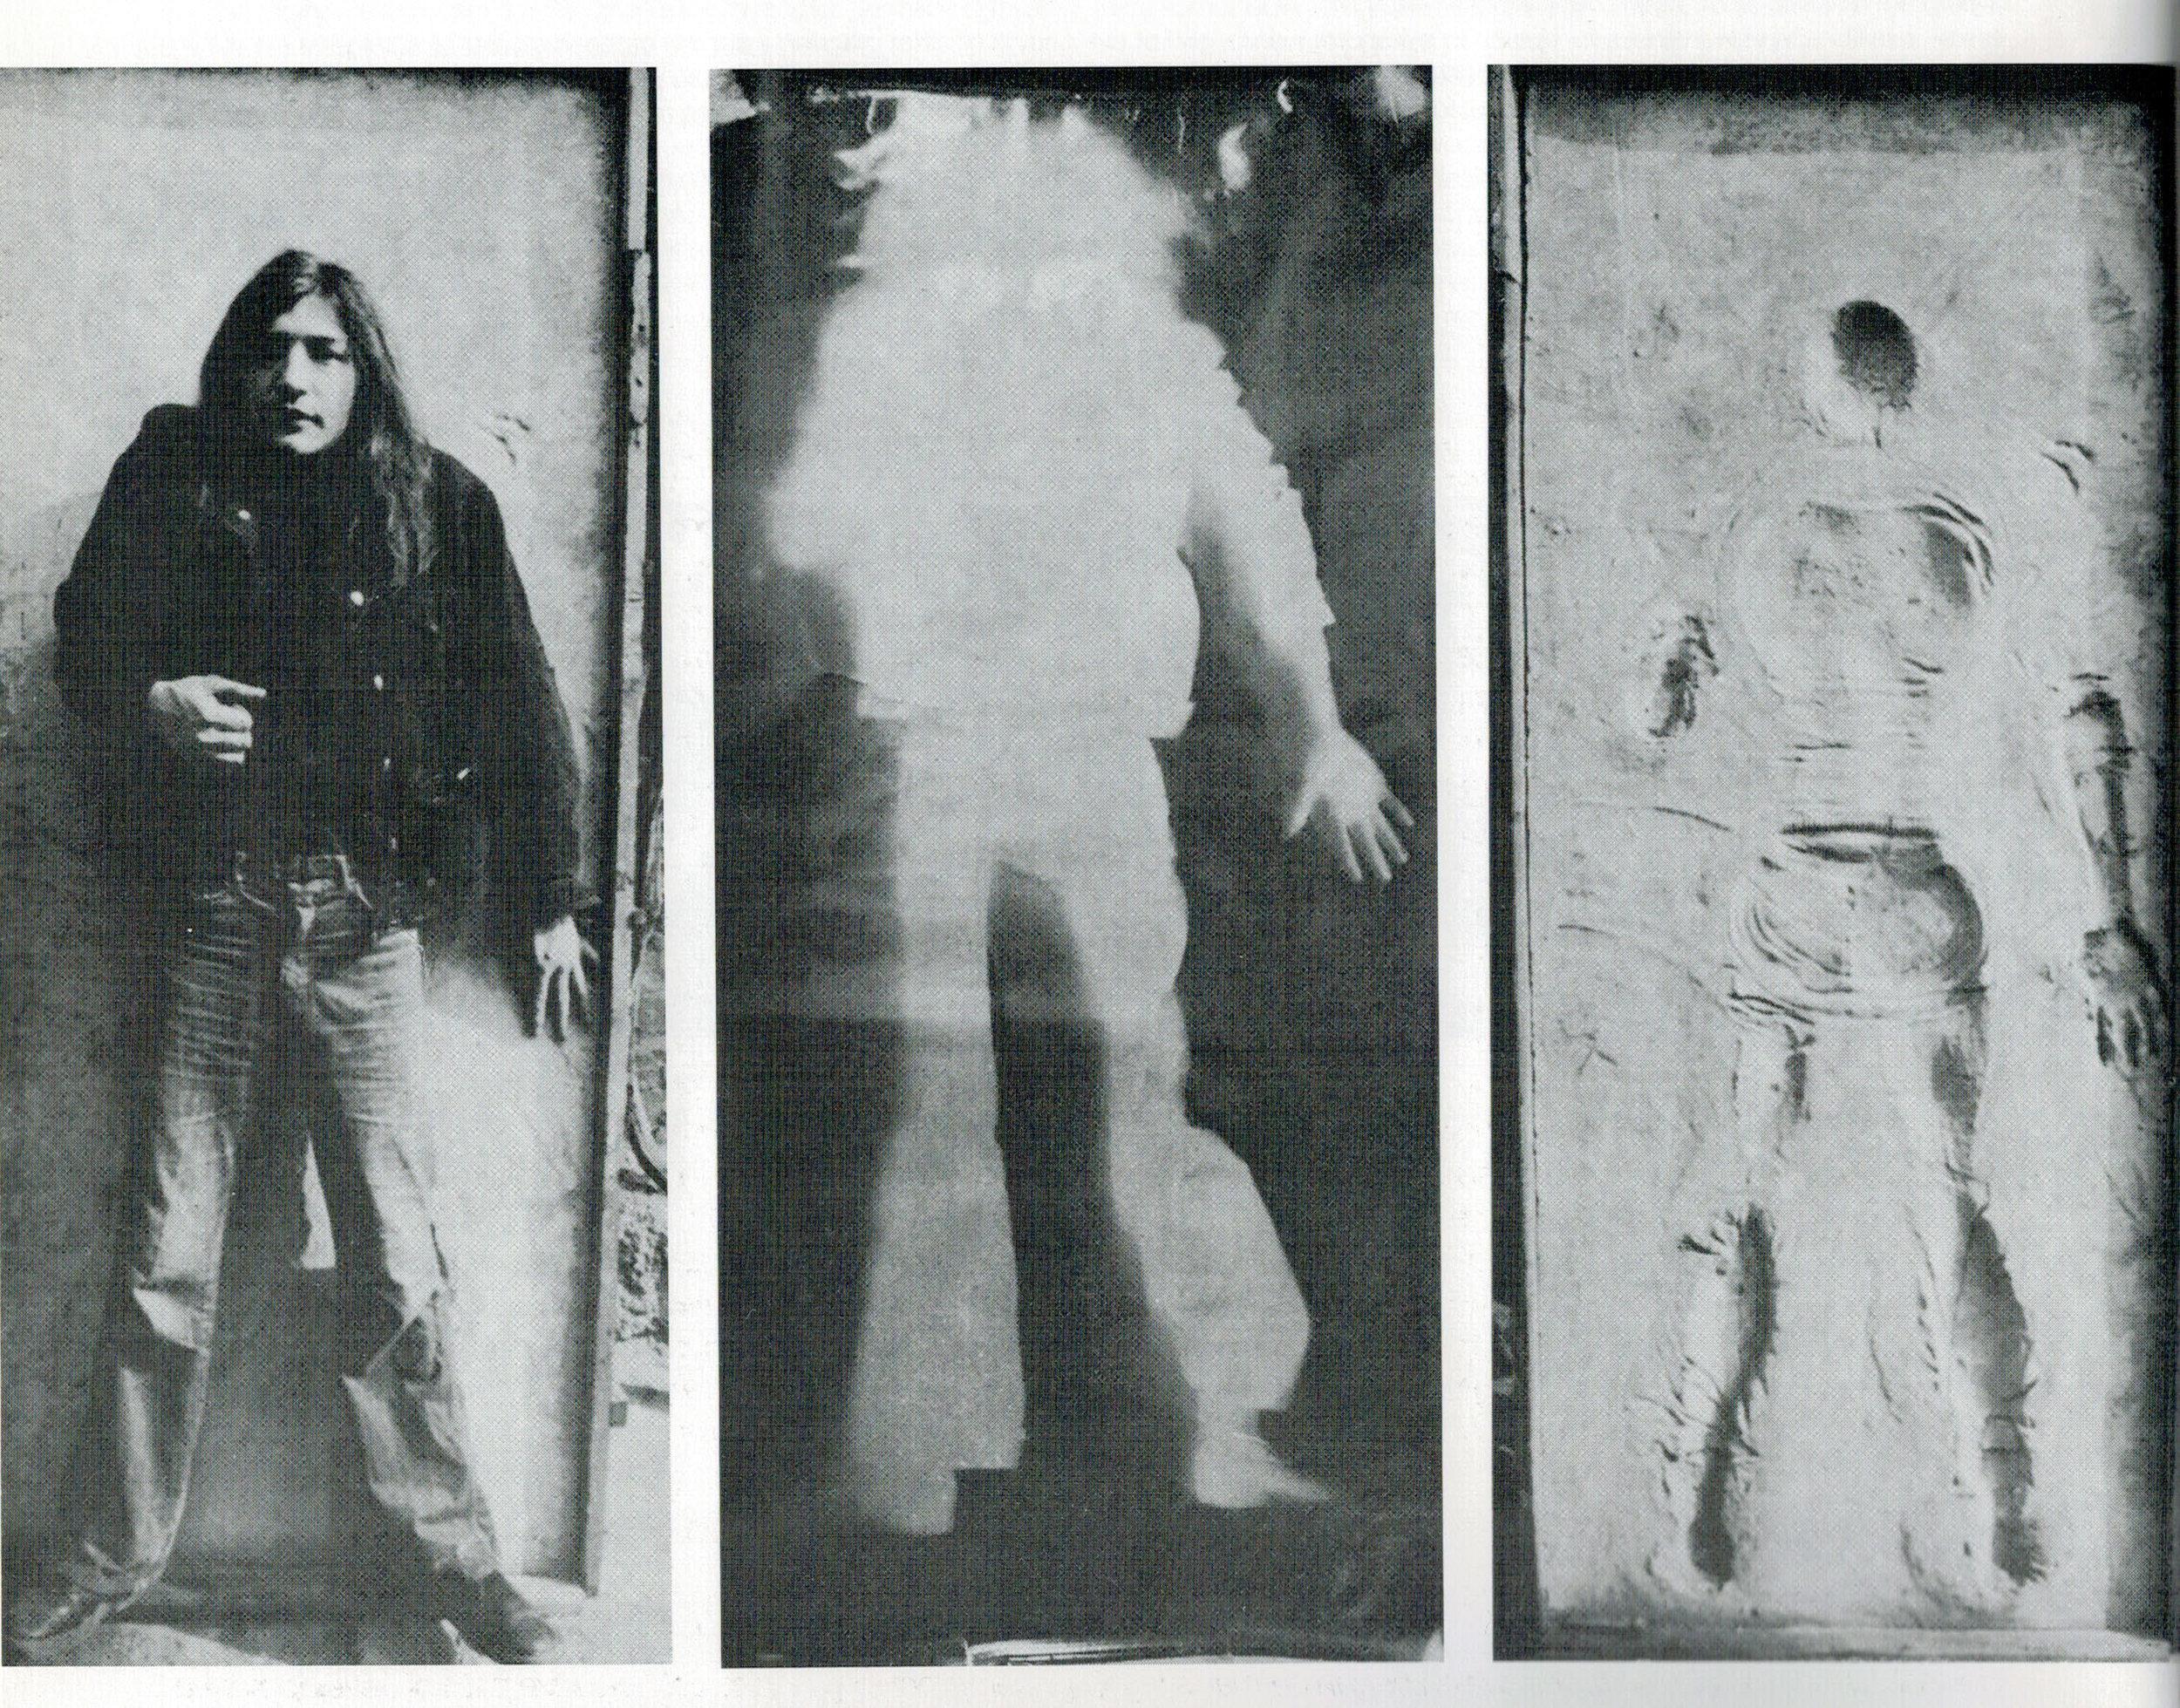 TRIPTYCH (1975-1977) black and white photograph, photogram, concrete